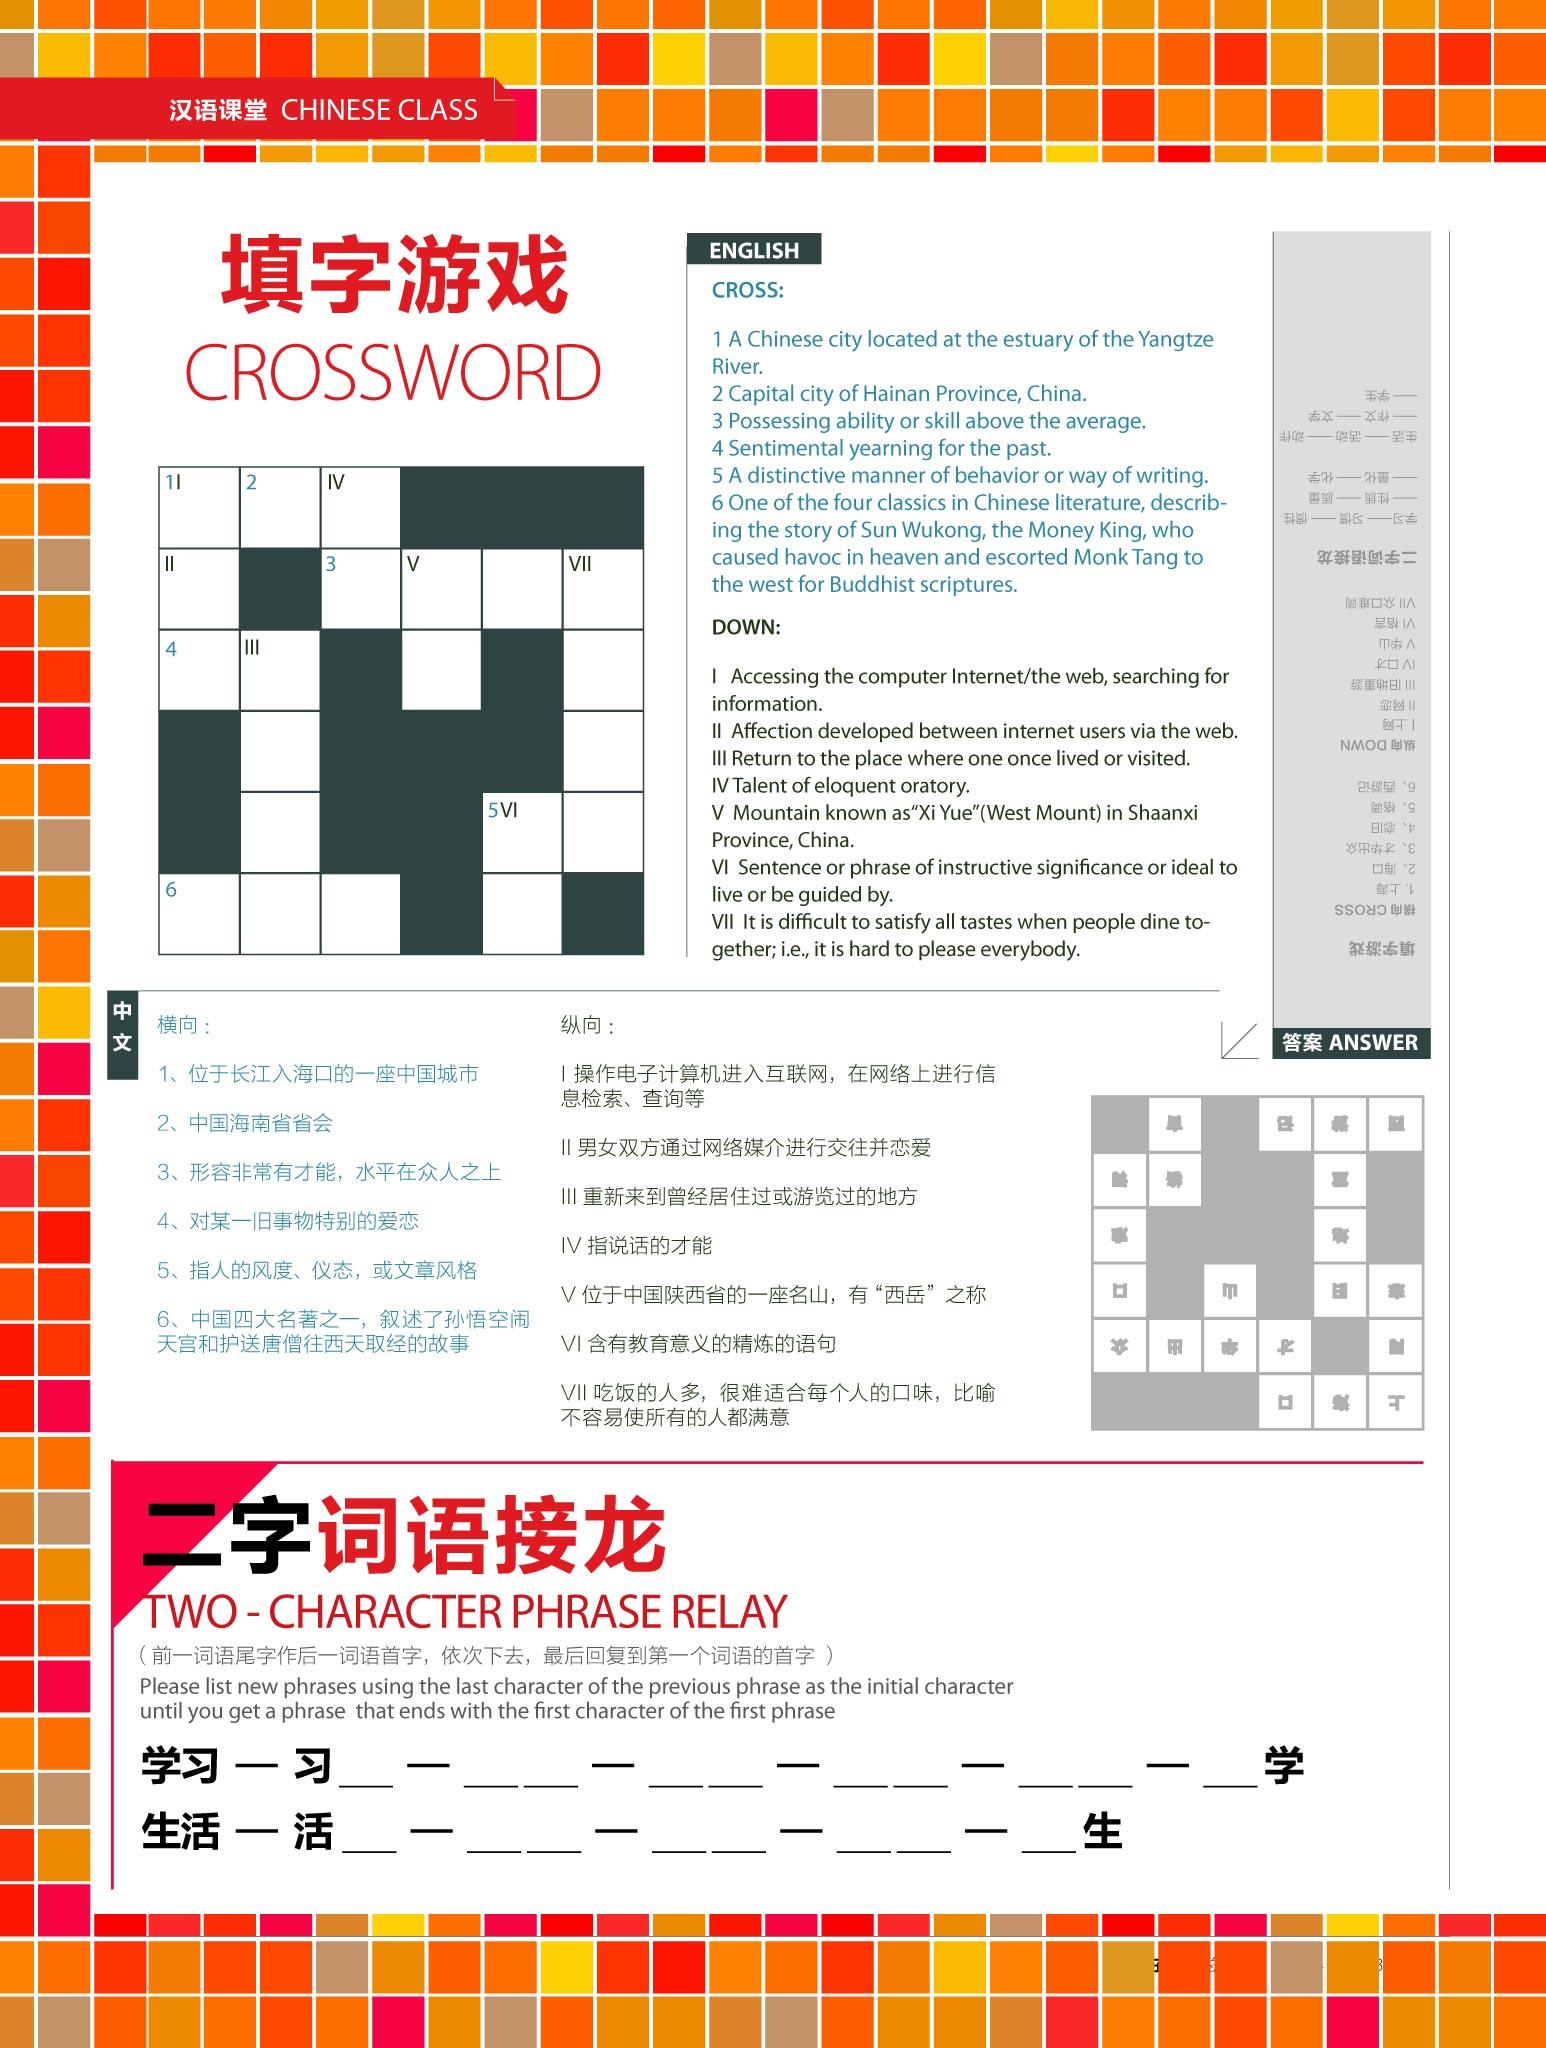 Chinese Class 12